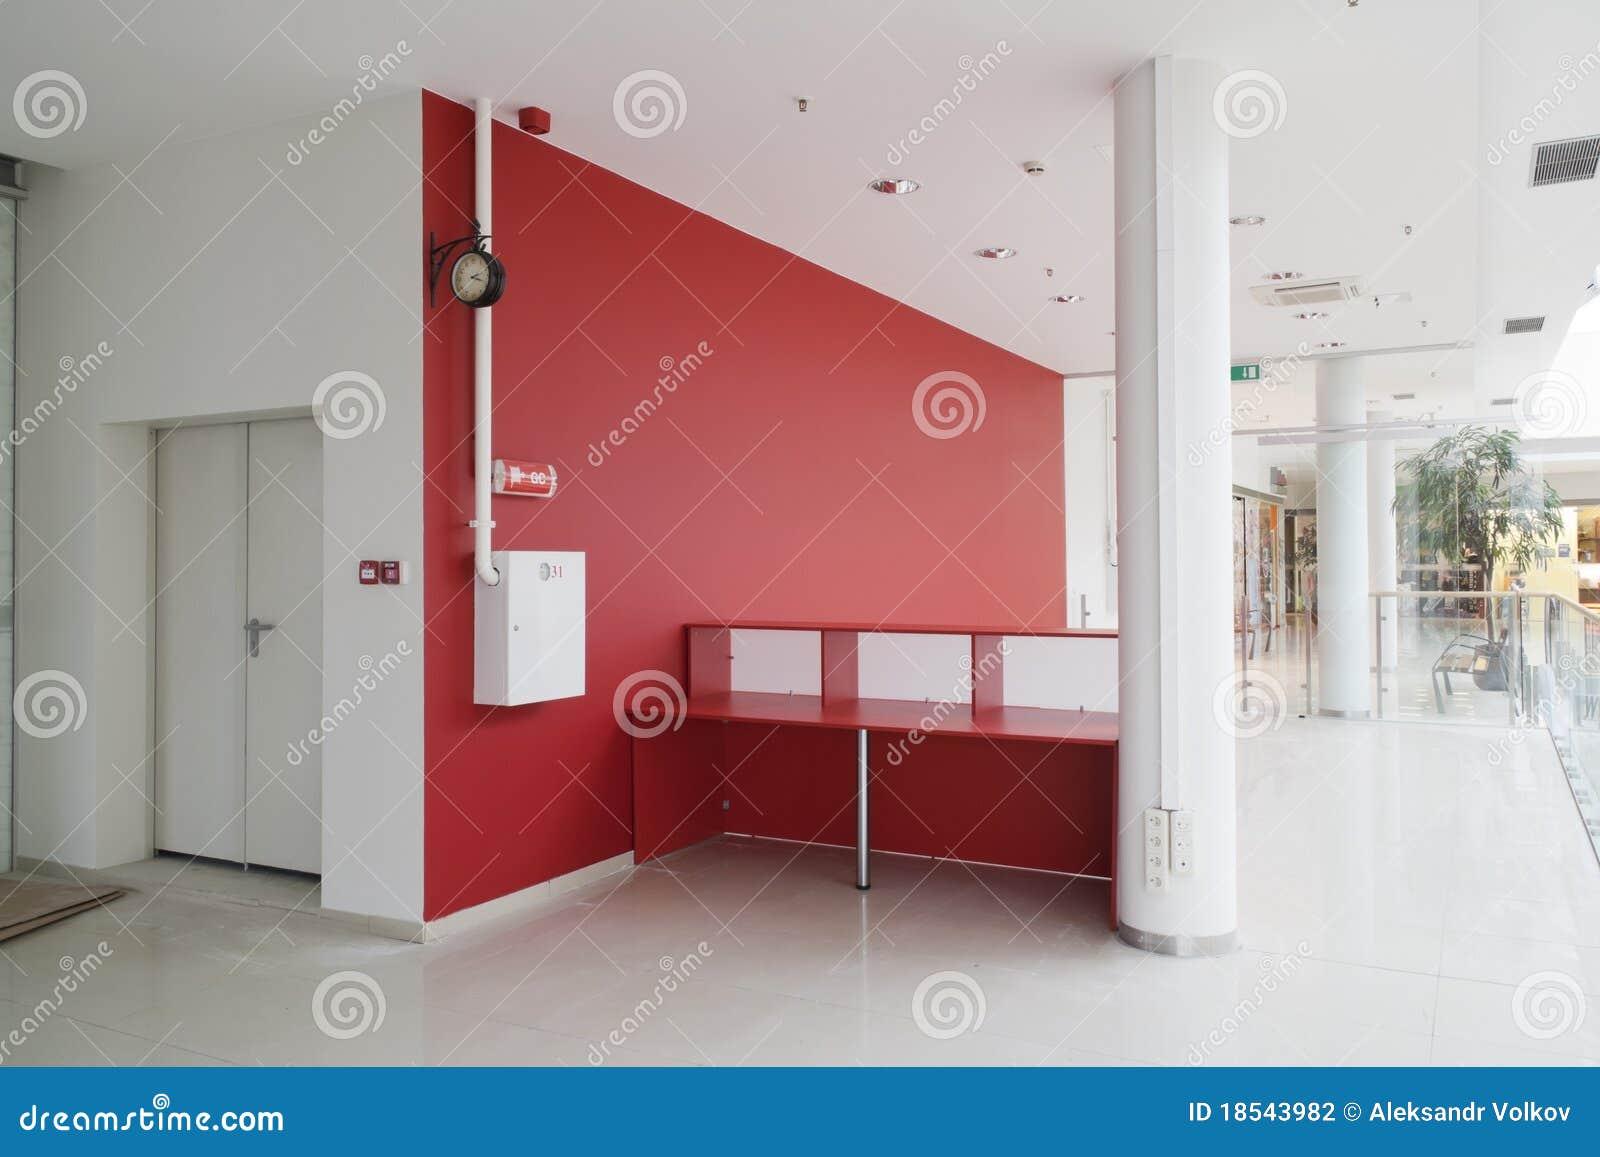 Mur rouge au bureau moderne photographie stock image for Grand bureau moderne